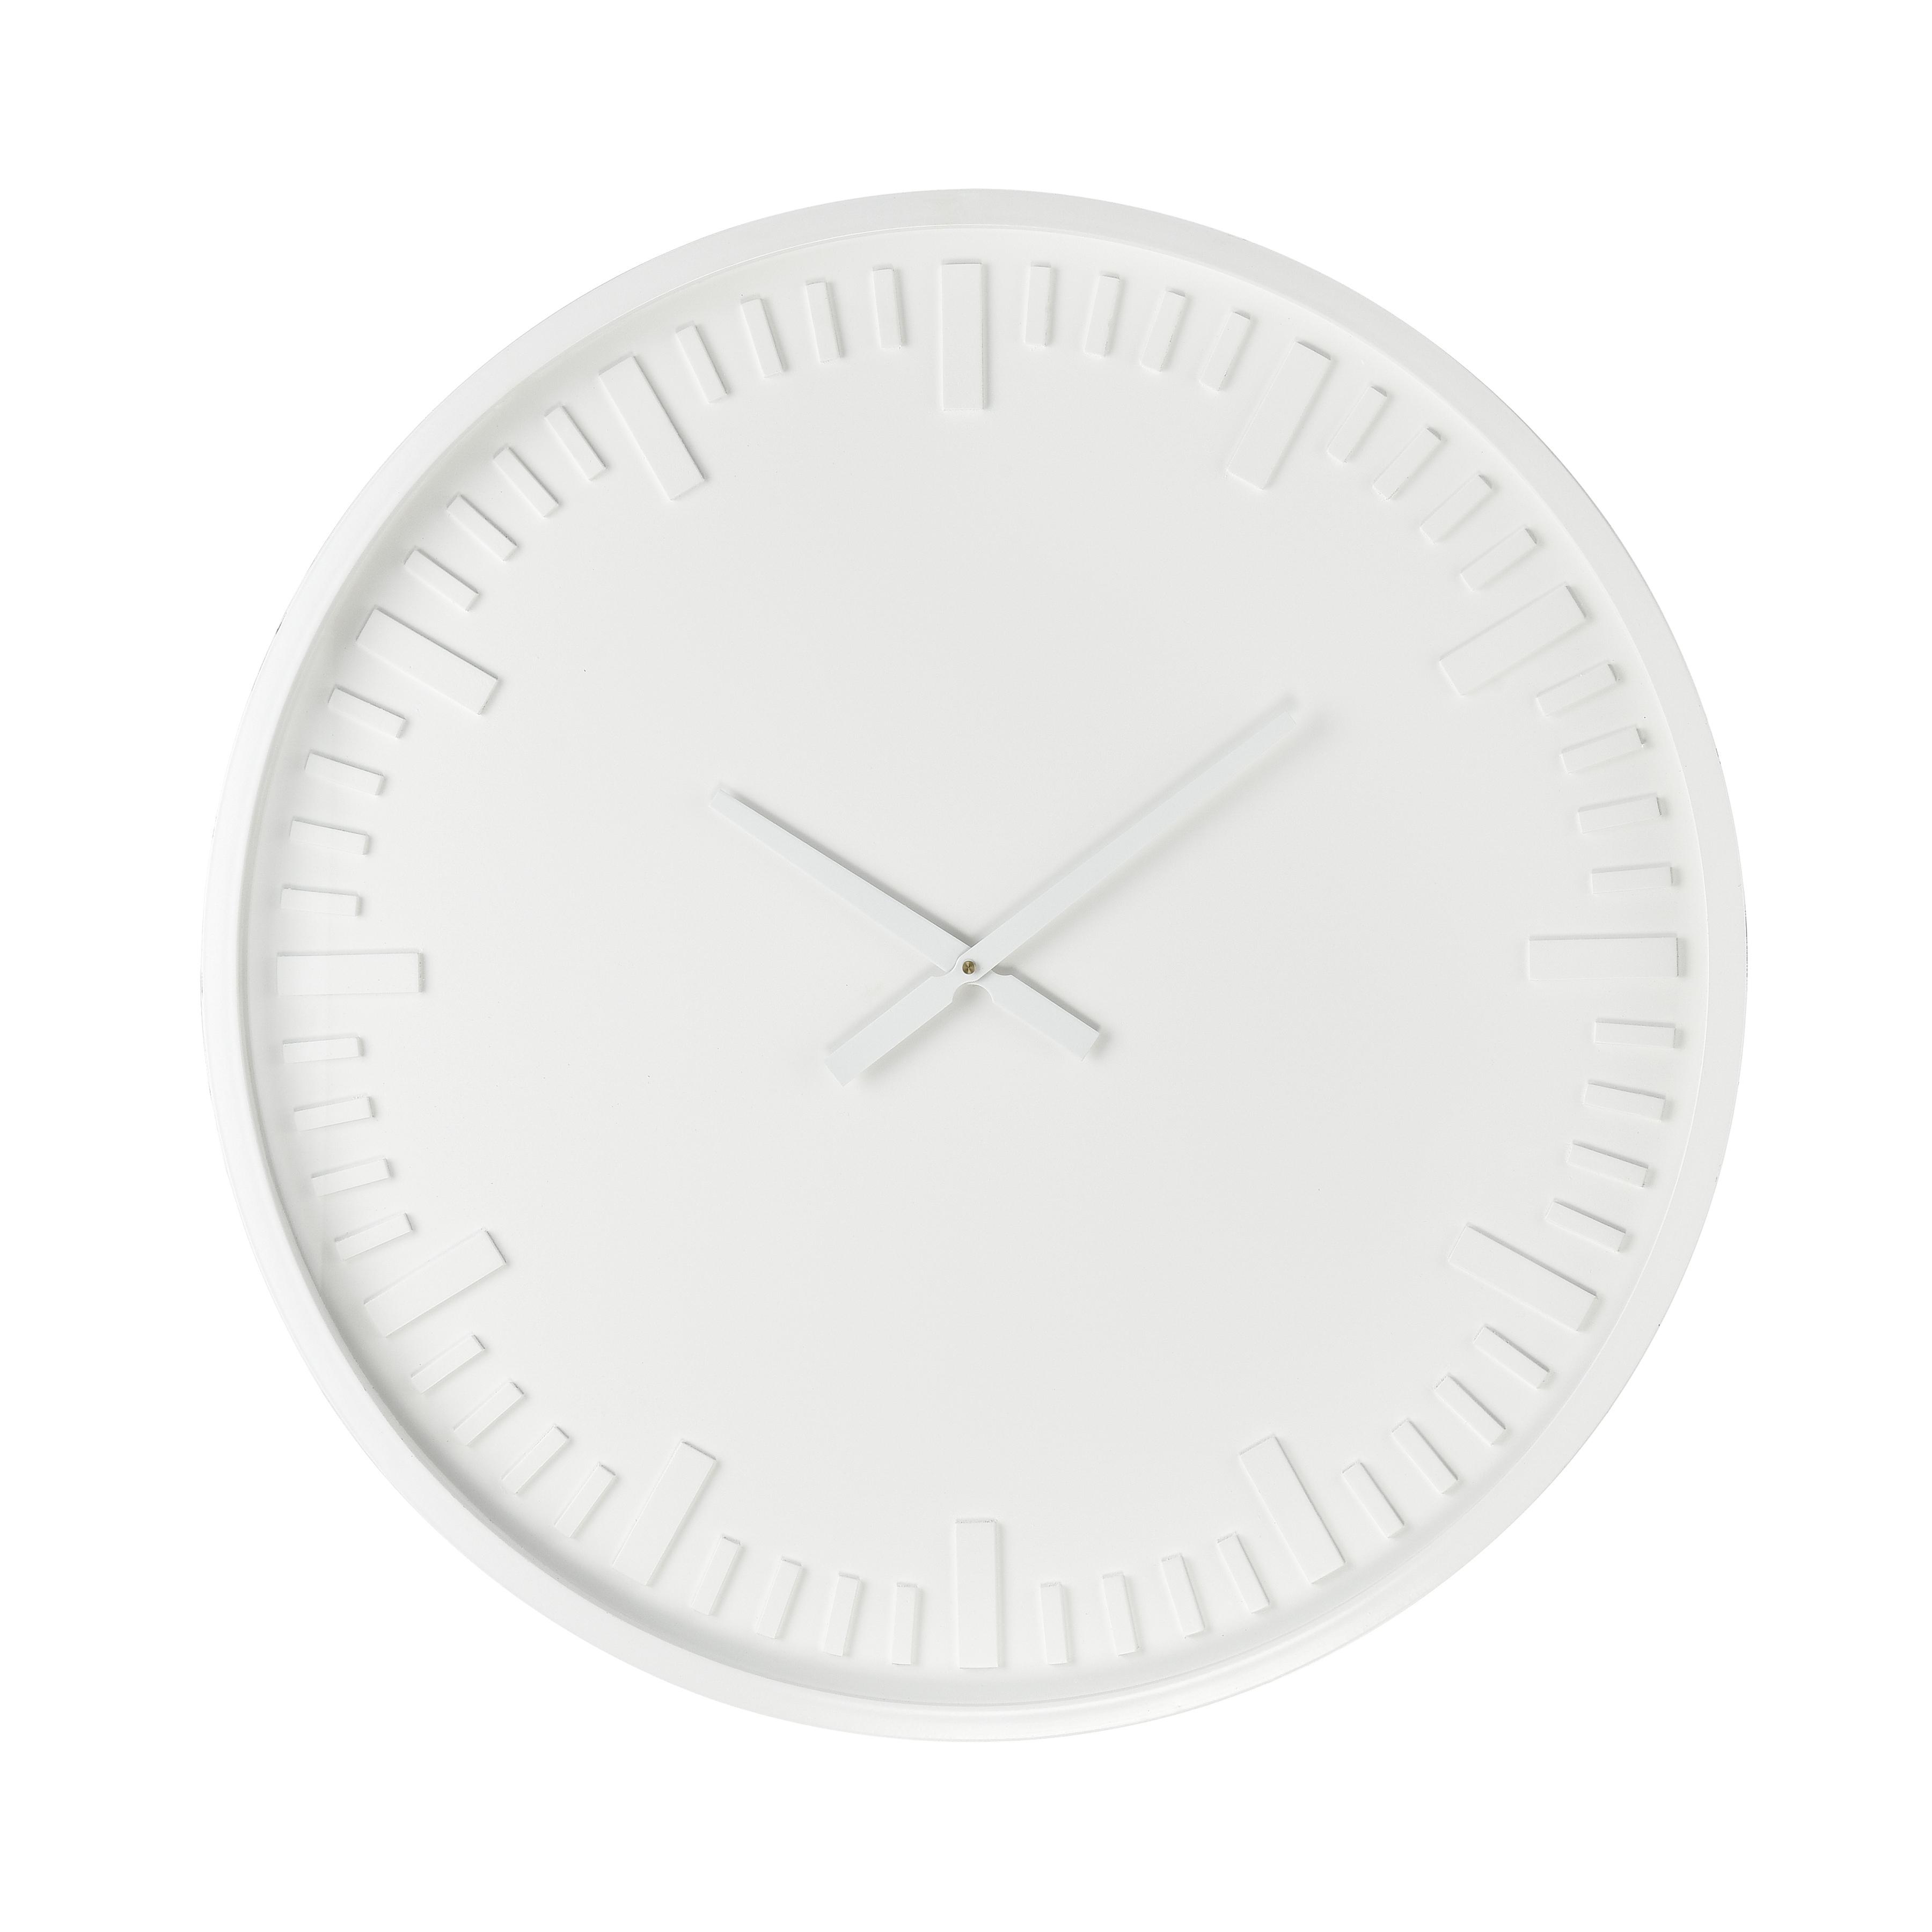 Marceau Wall Clock | Elk Home